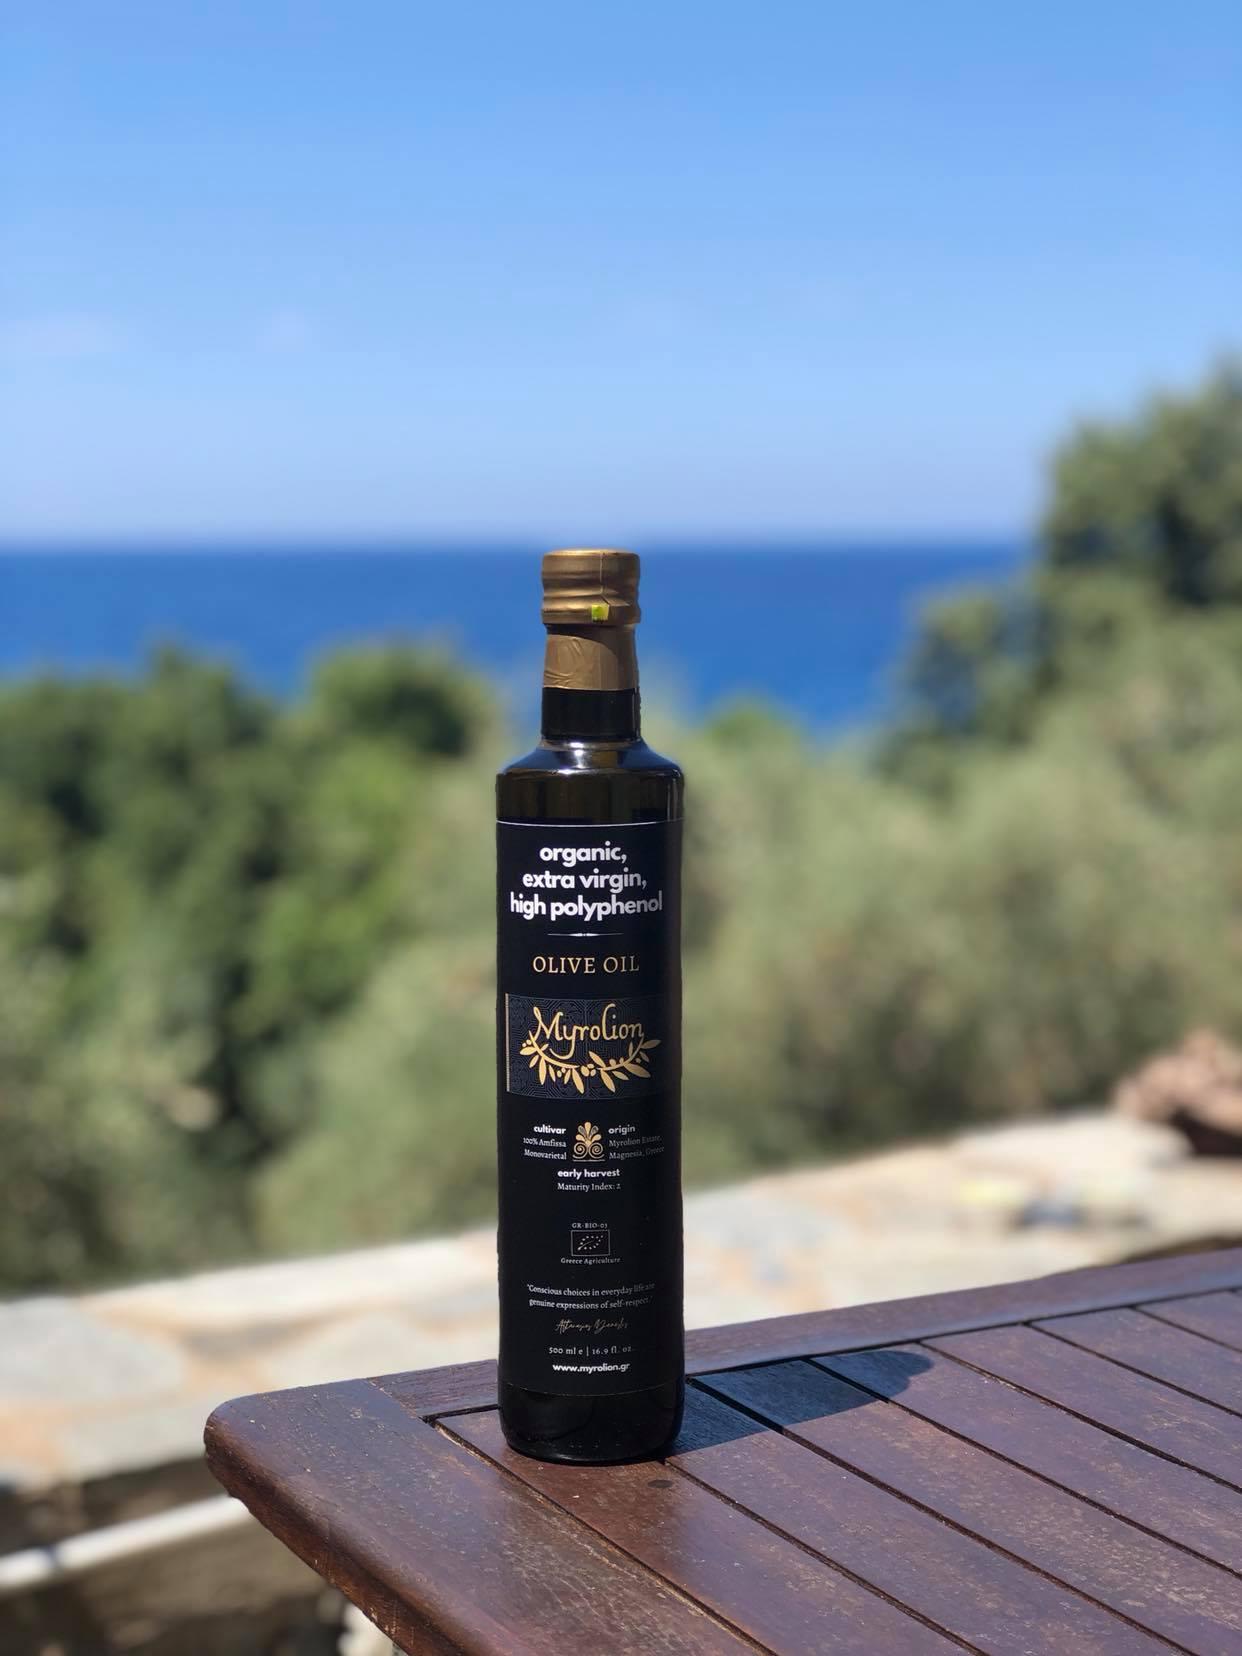 New Myrolion Bottle High Polyphenol Olive Oil